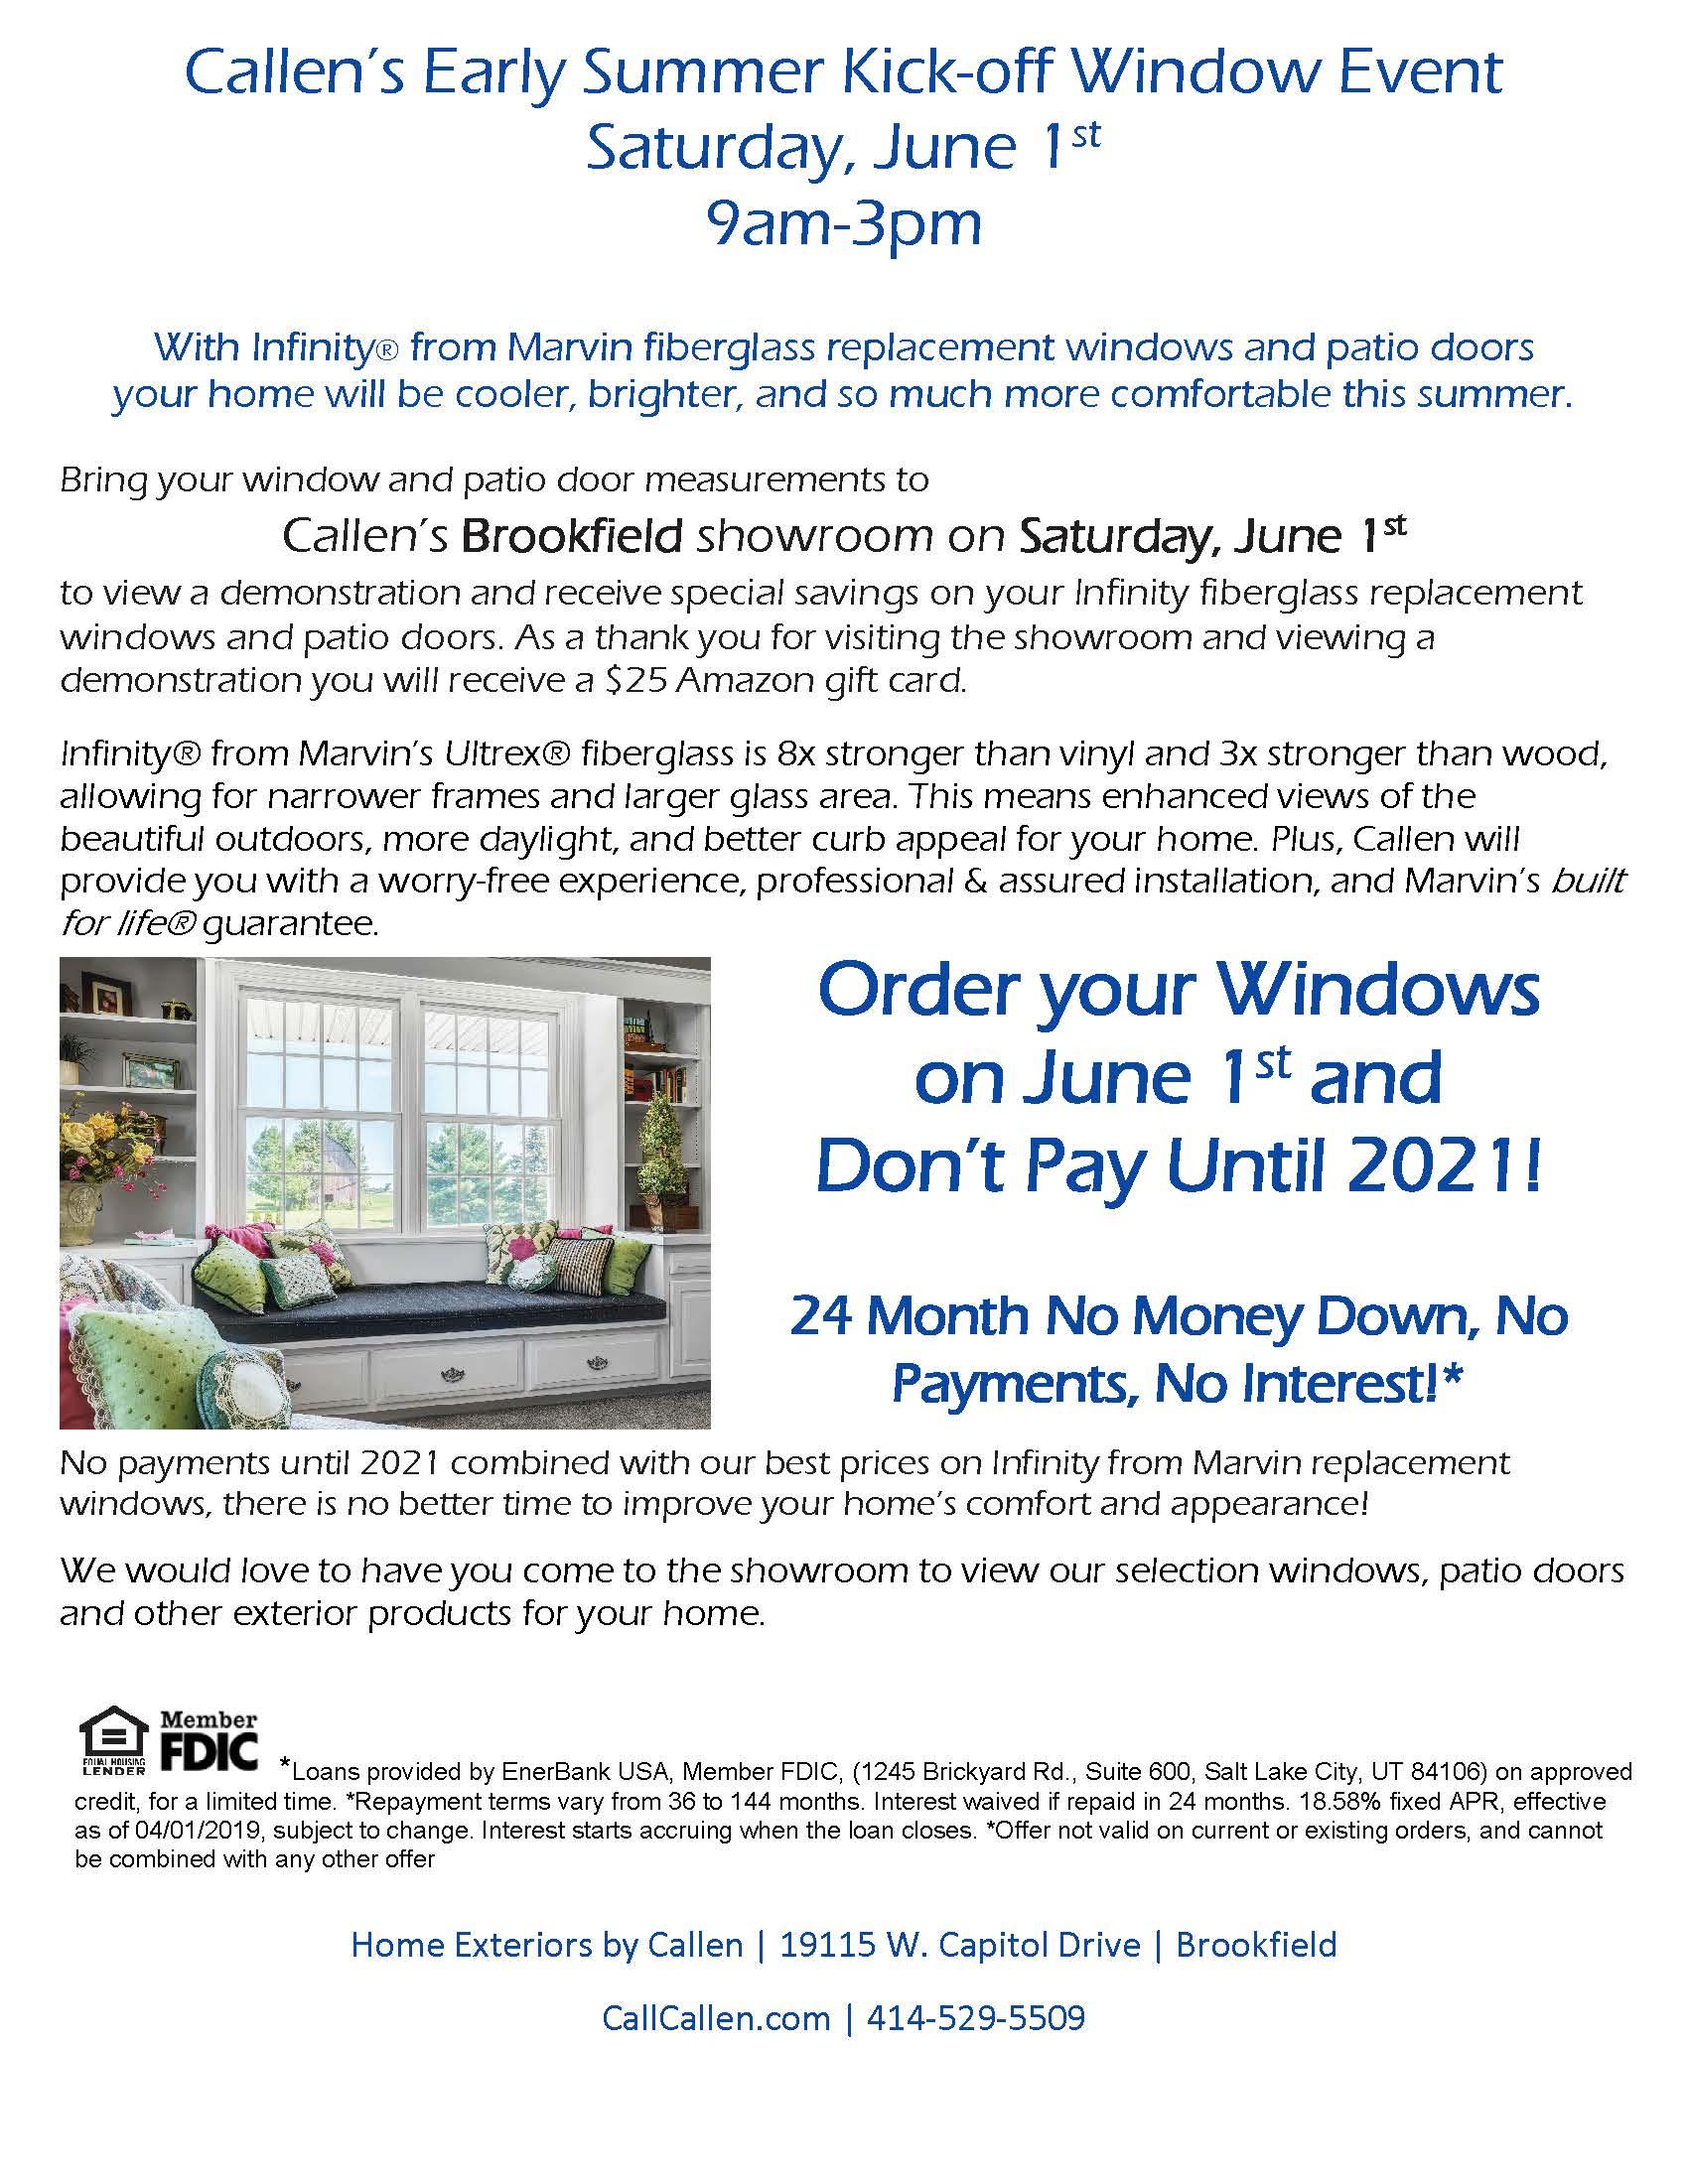 Callen Early Summer Kick-Off Window Event